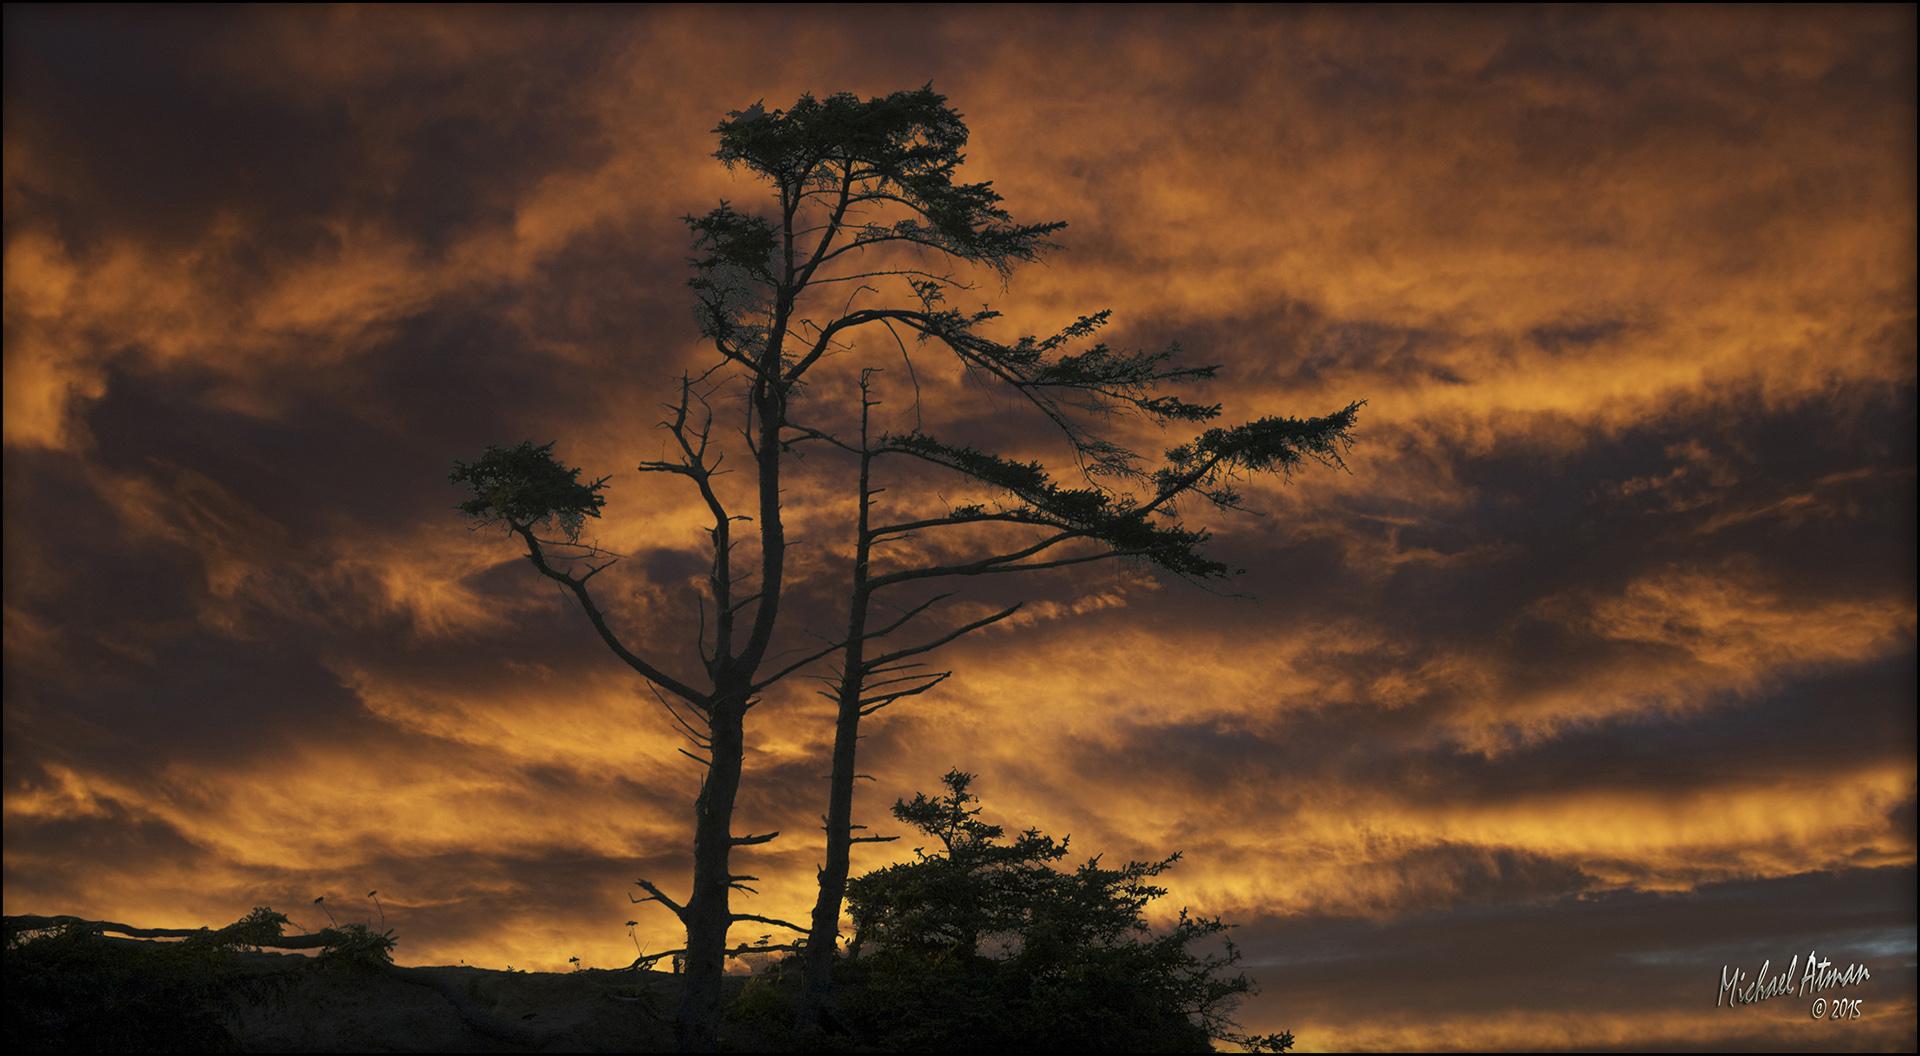 Tree At Sunset by MichaelAtman